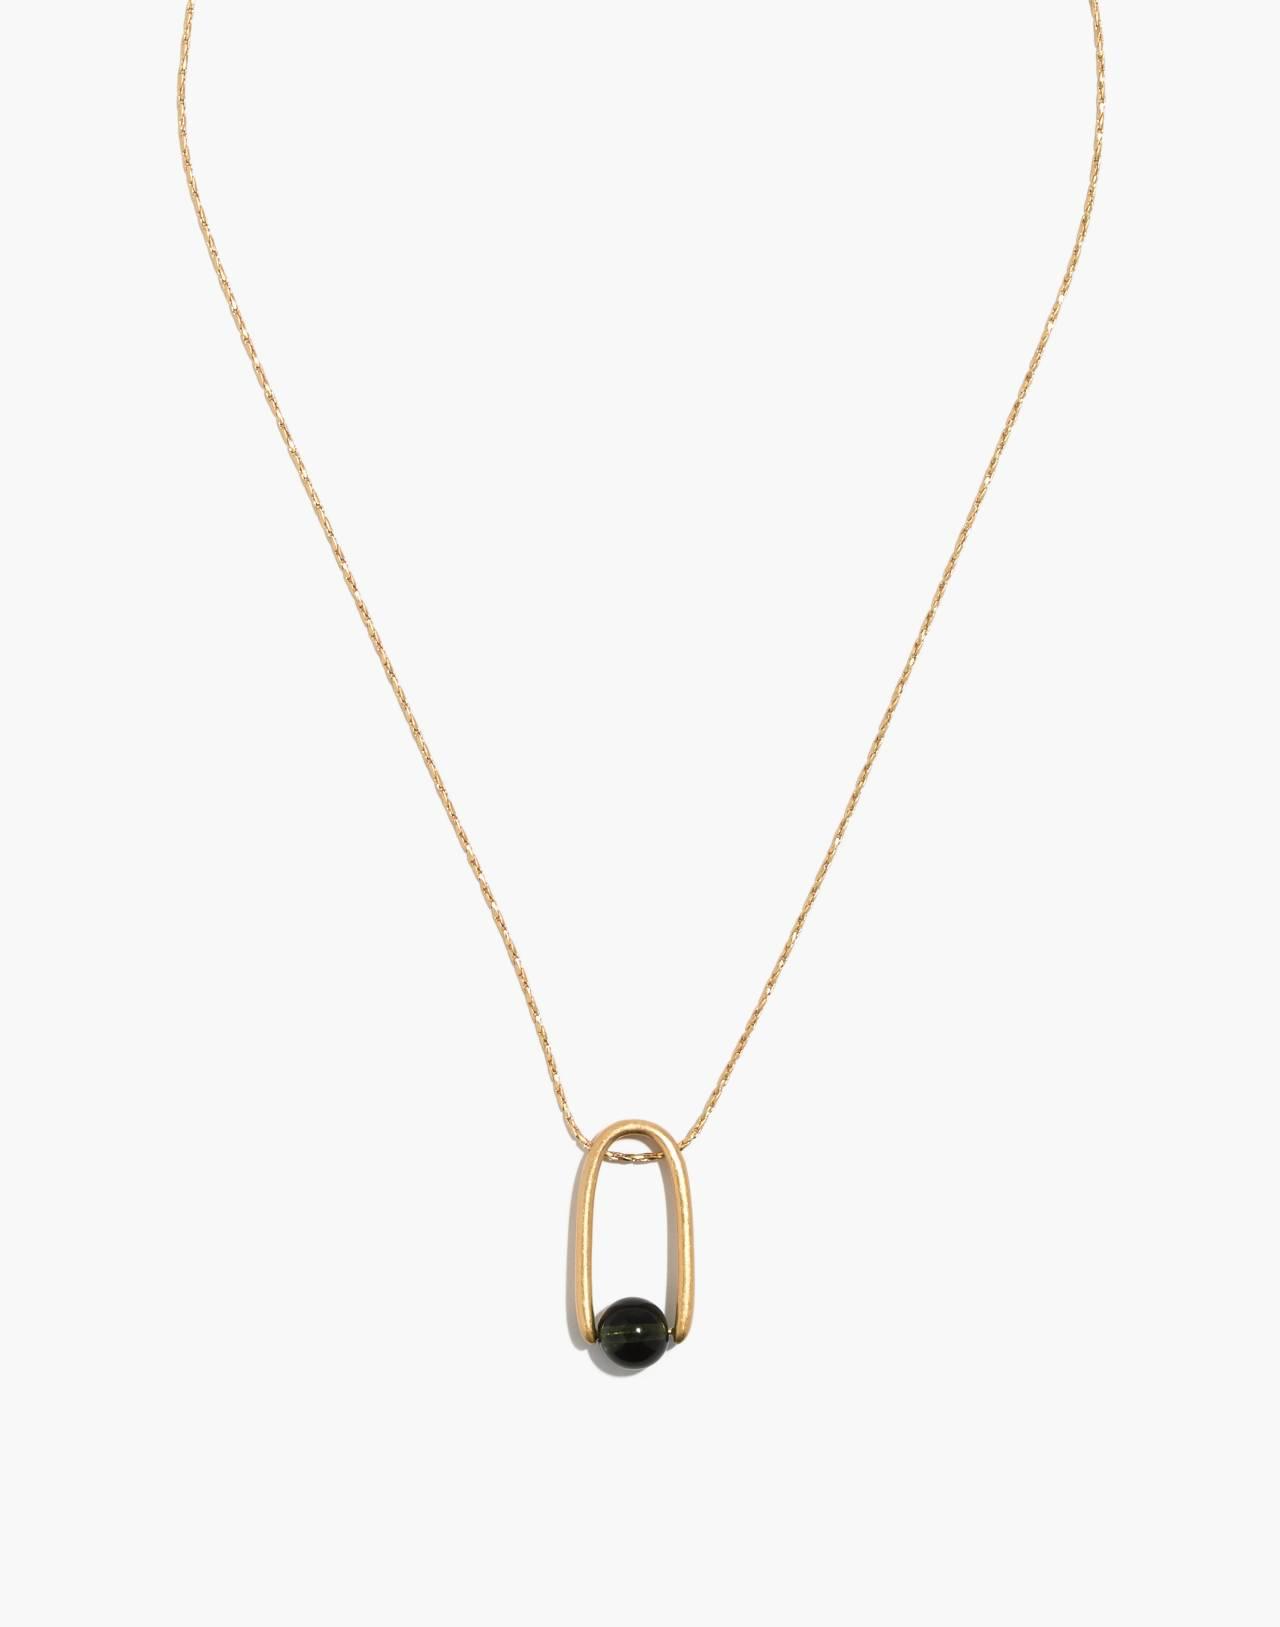 Resin Pinball Pendant Necklace in grandpa image 1